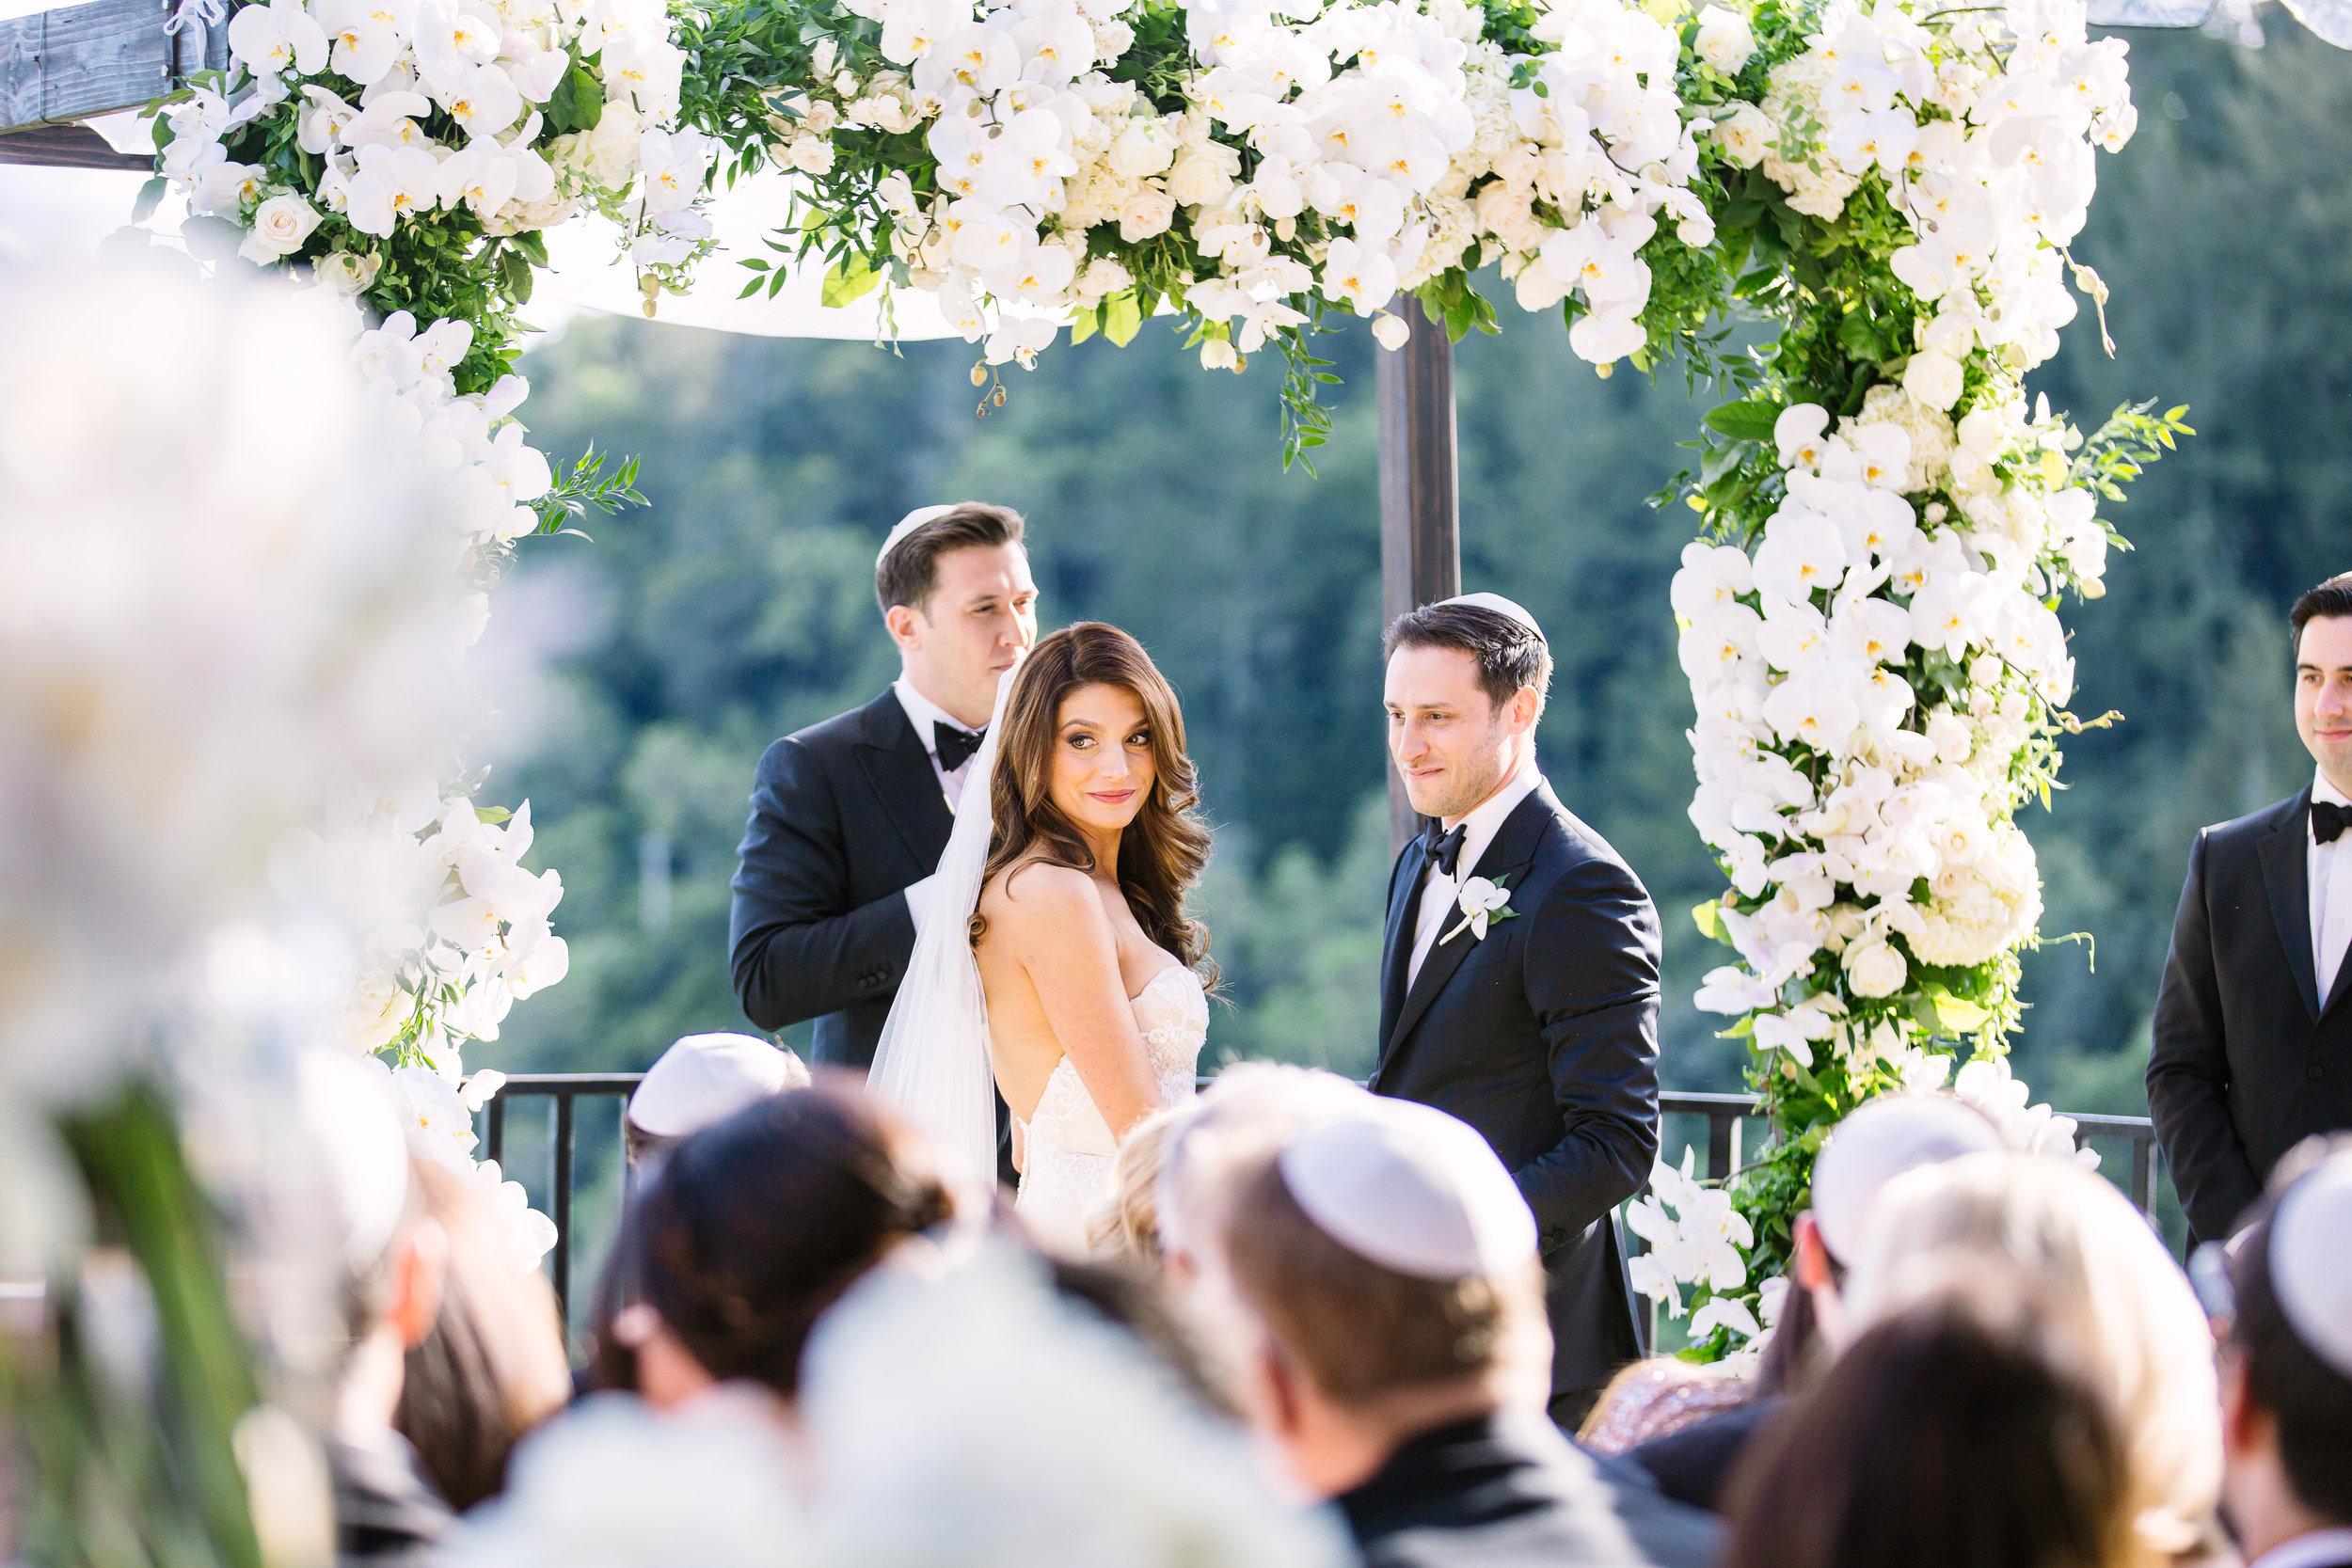 Brea & Jake Wedding Photos - Brian Leahy Photo-756.jpg